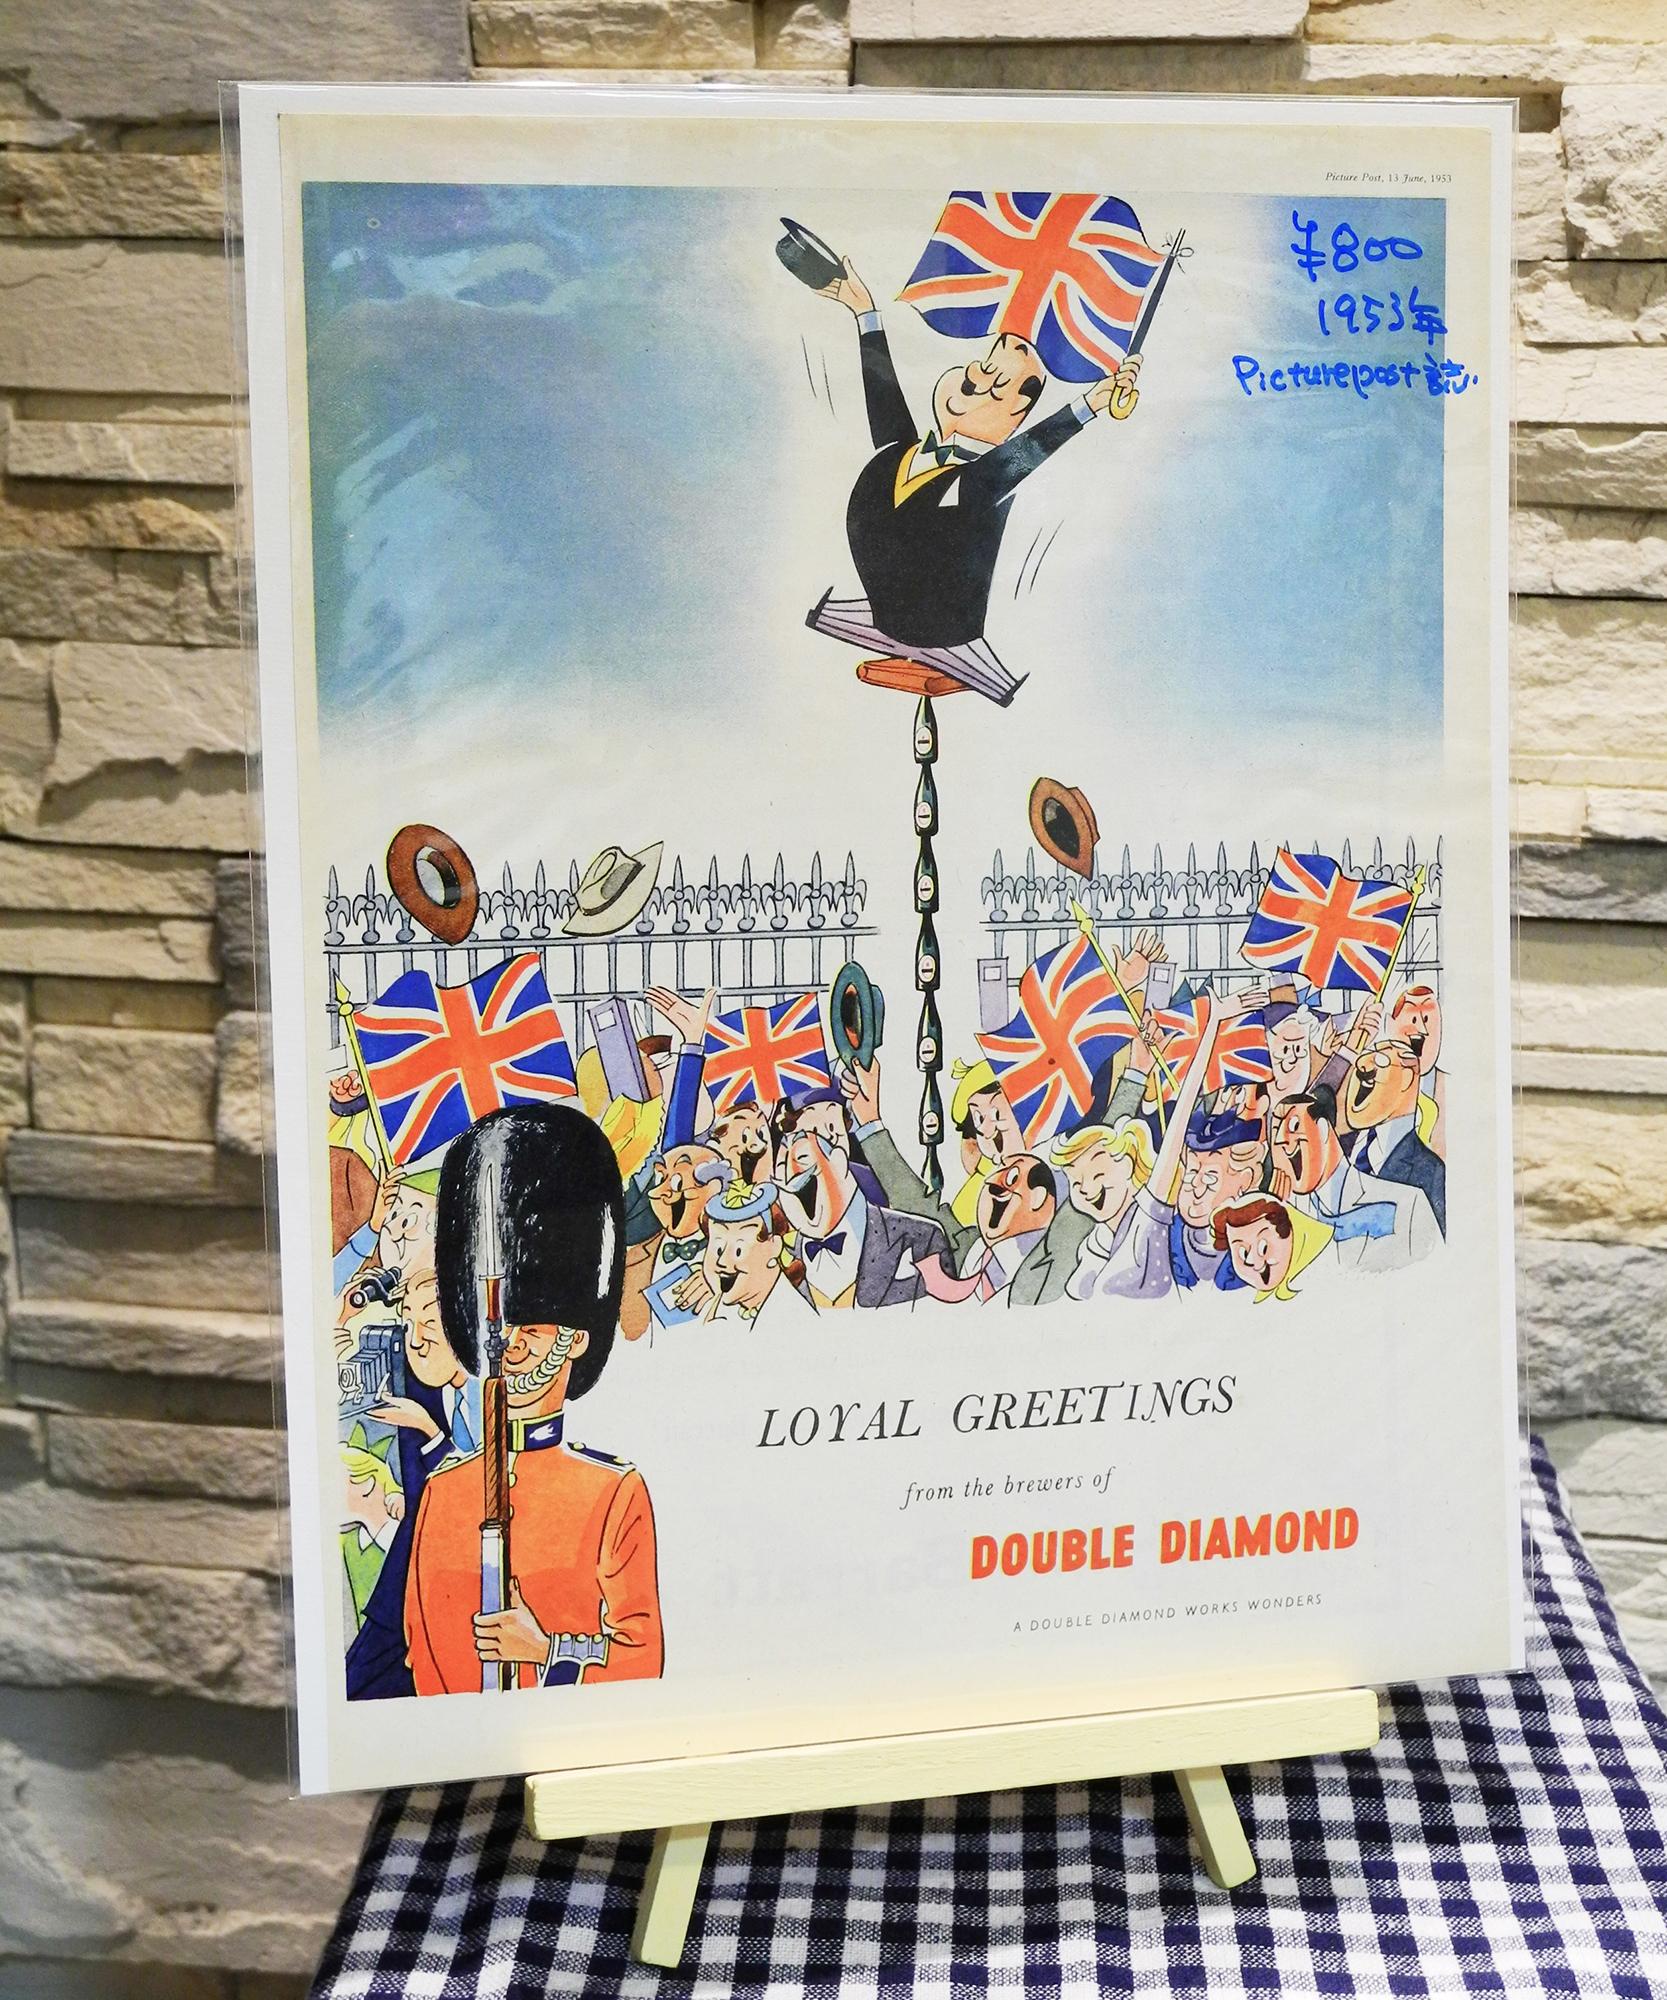 【Vintage品】雑誌切り抜き広告 DOUBLE DIAMOND 1953年 イギリス Picure Post誌 /0234l